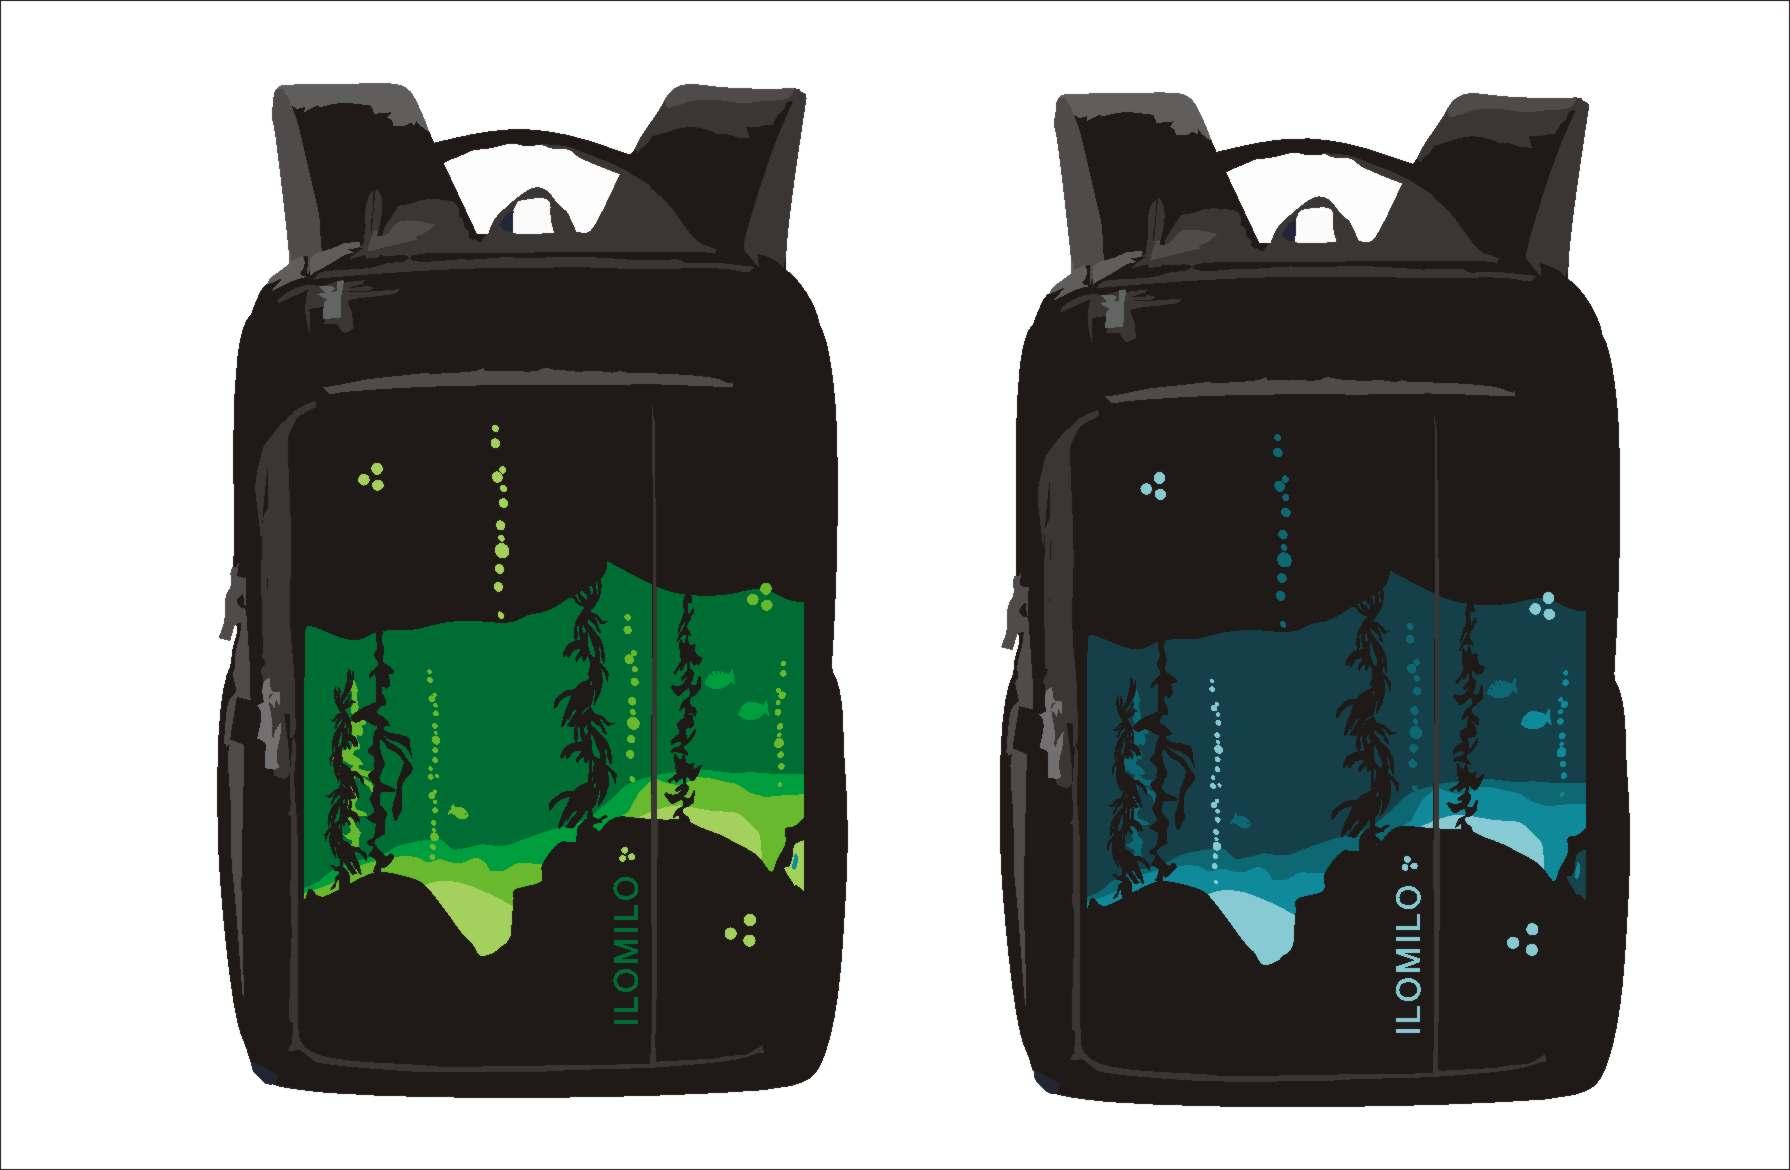 Конкурс на создание оригинального принта для рюкзаков фото f_5375f871966bb92a.jpg